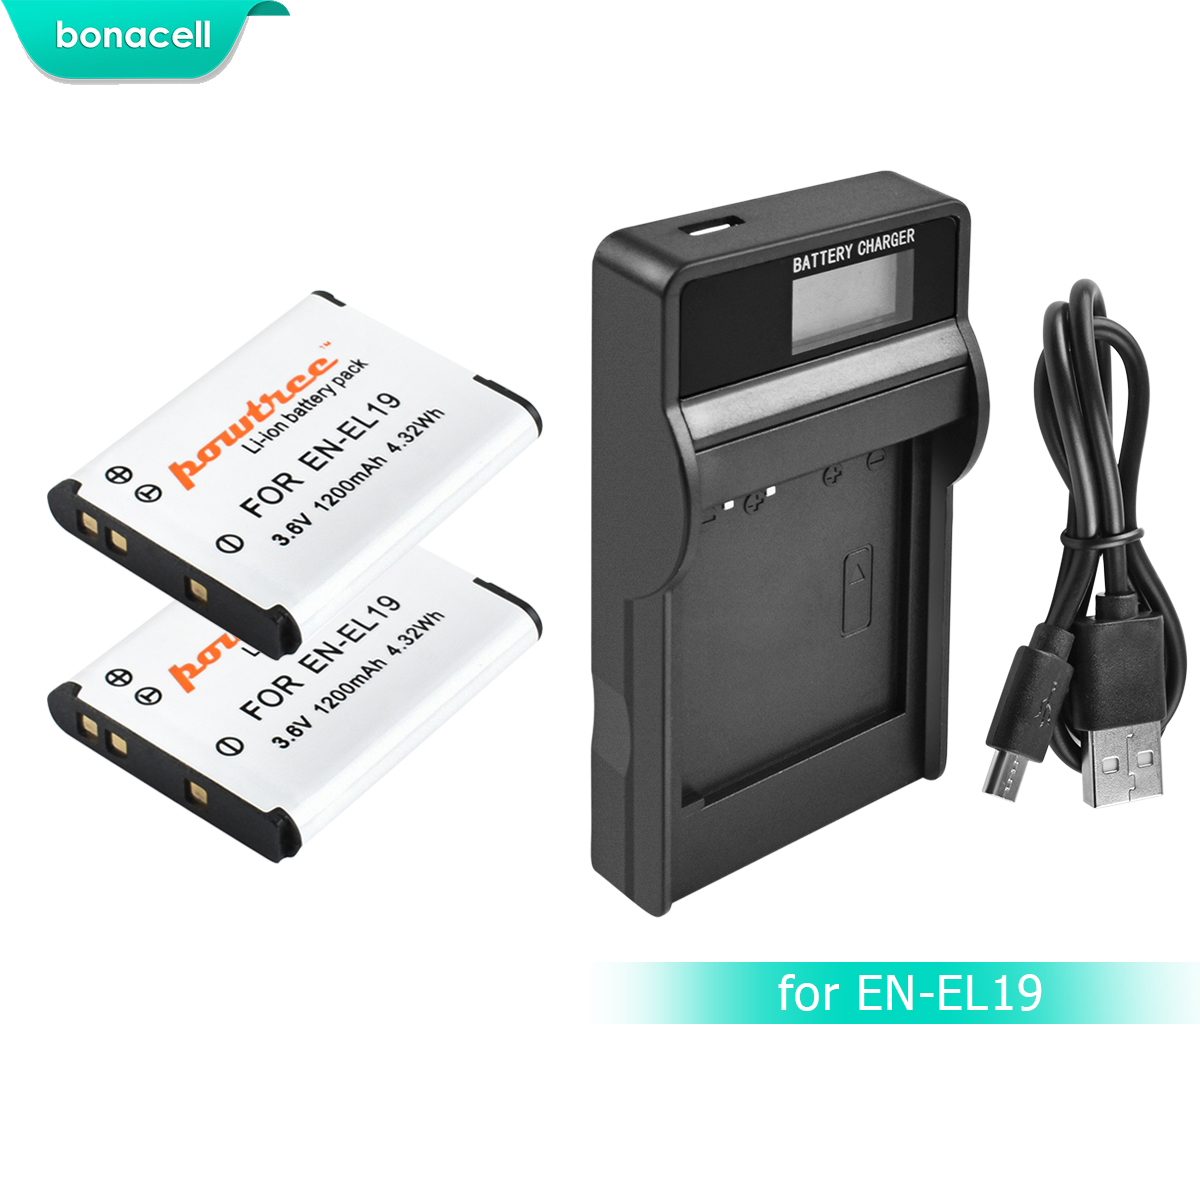 Bonacell 1200mAh ENEL19 EN-EL19 Battery+LCD Charger For Nikon Coolpix S32 S33 S100 S2500 S2750 S3100 S3200 S3300 S3400 S3500 L10